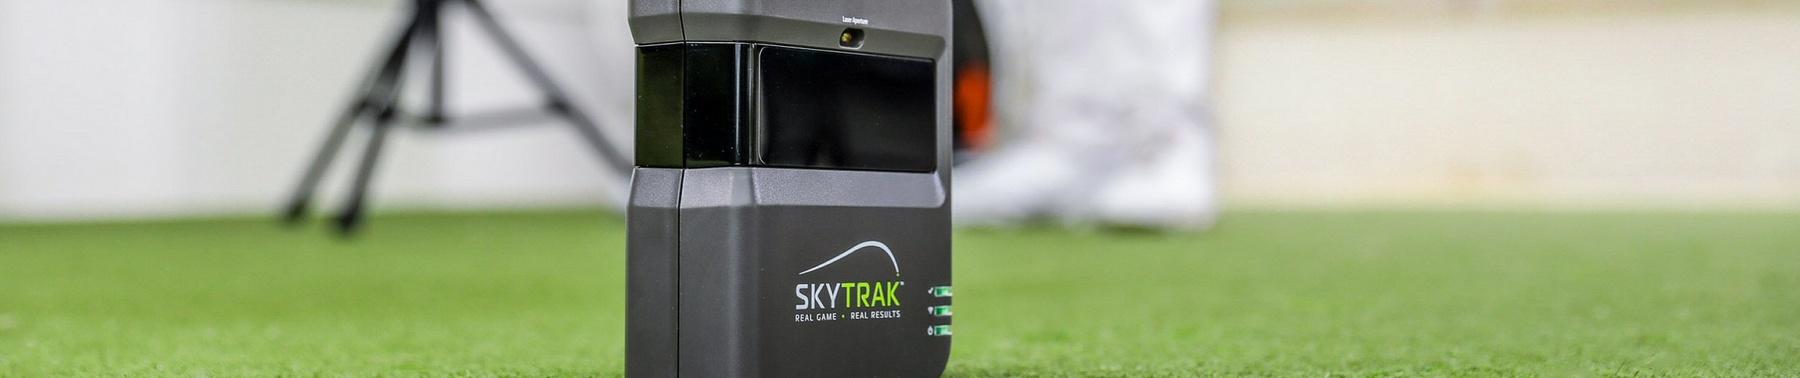 skytrak_may2019offer_2380x500